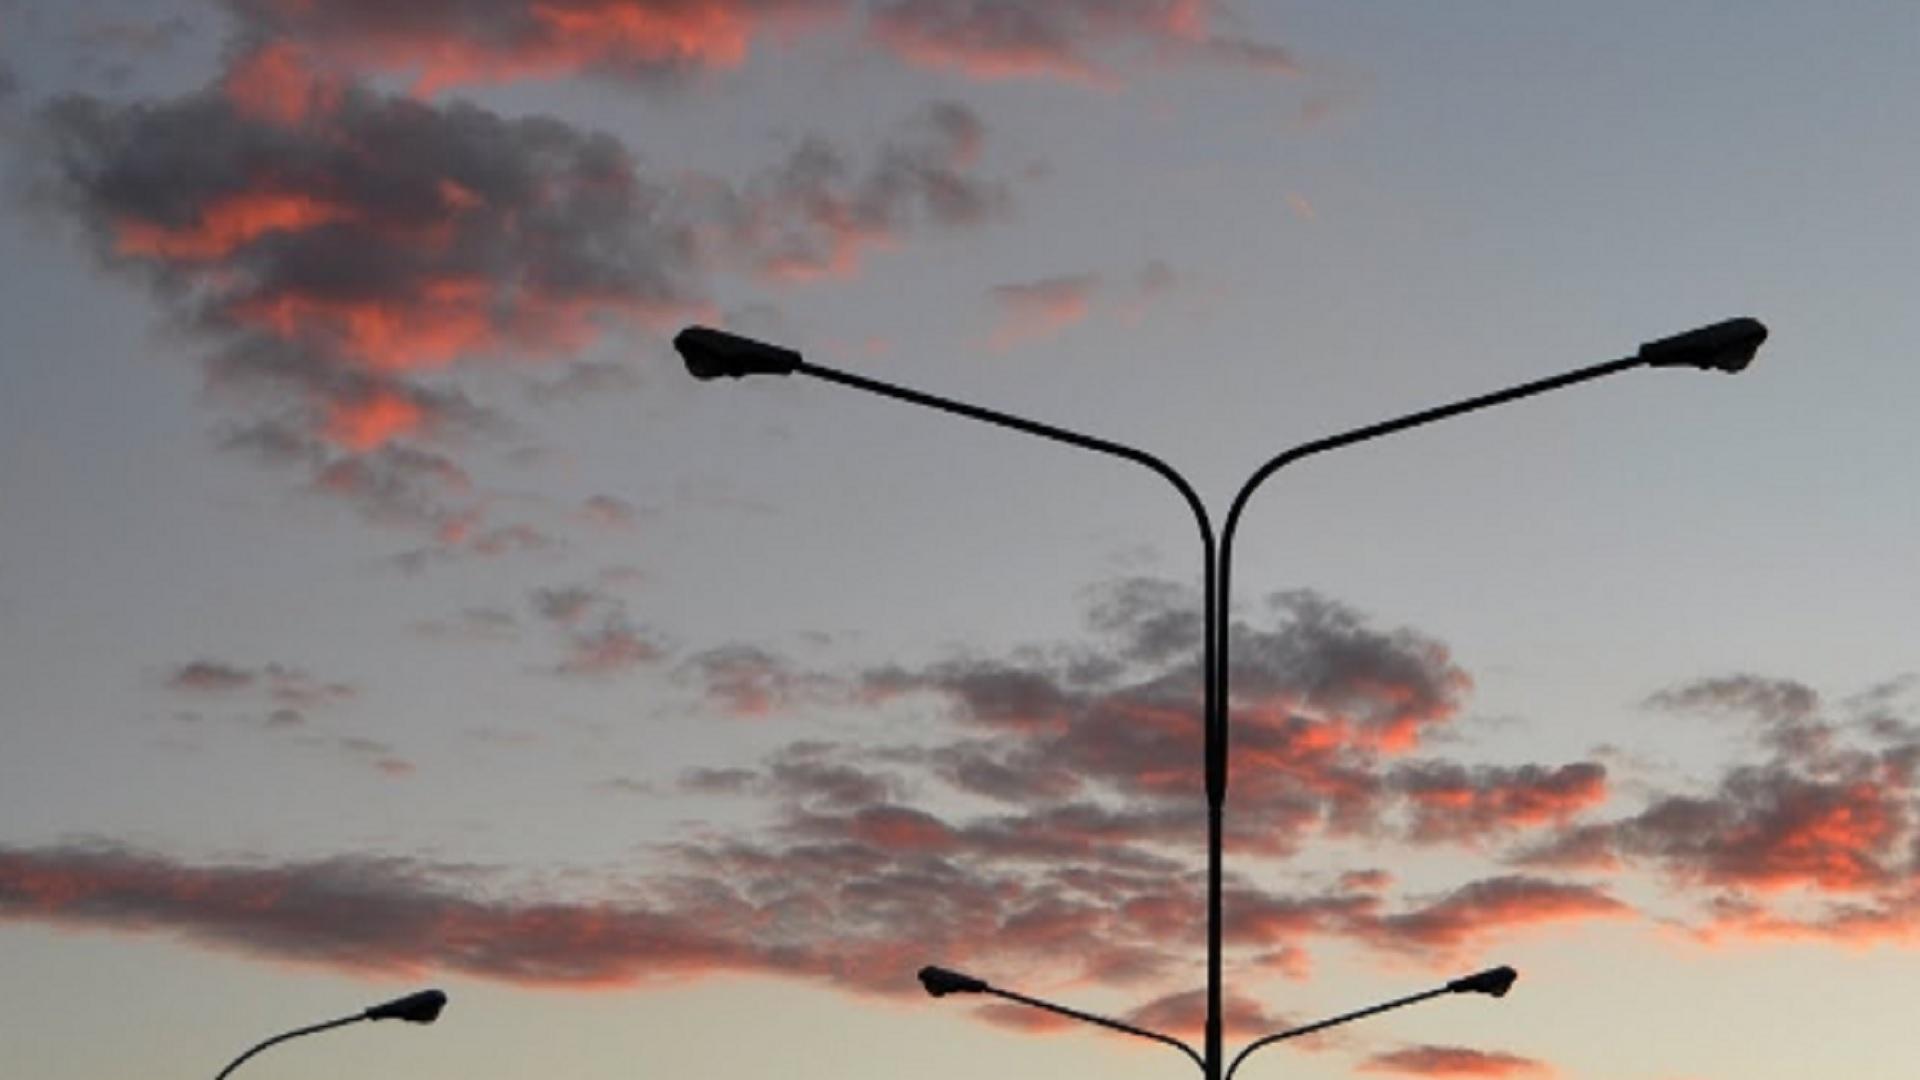 illuminazione pubblica spenta